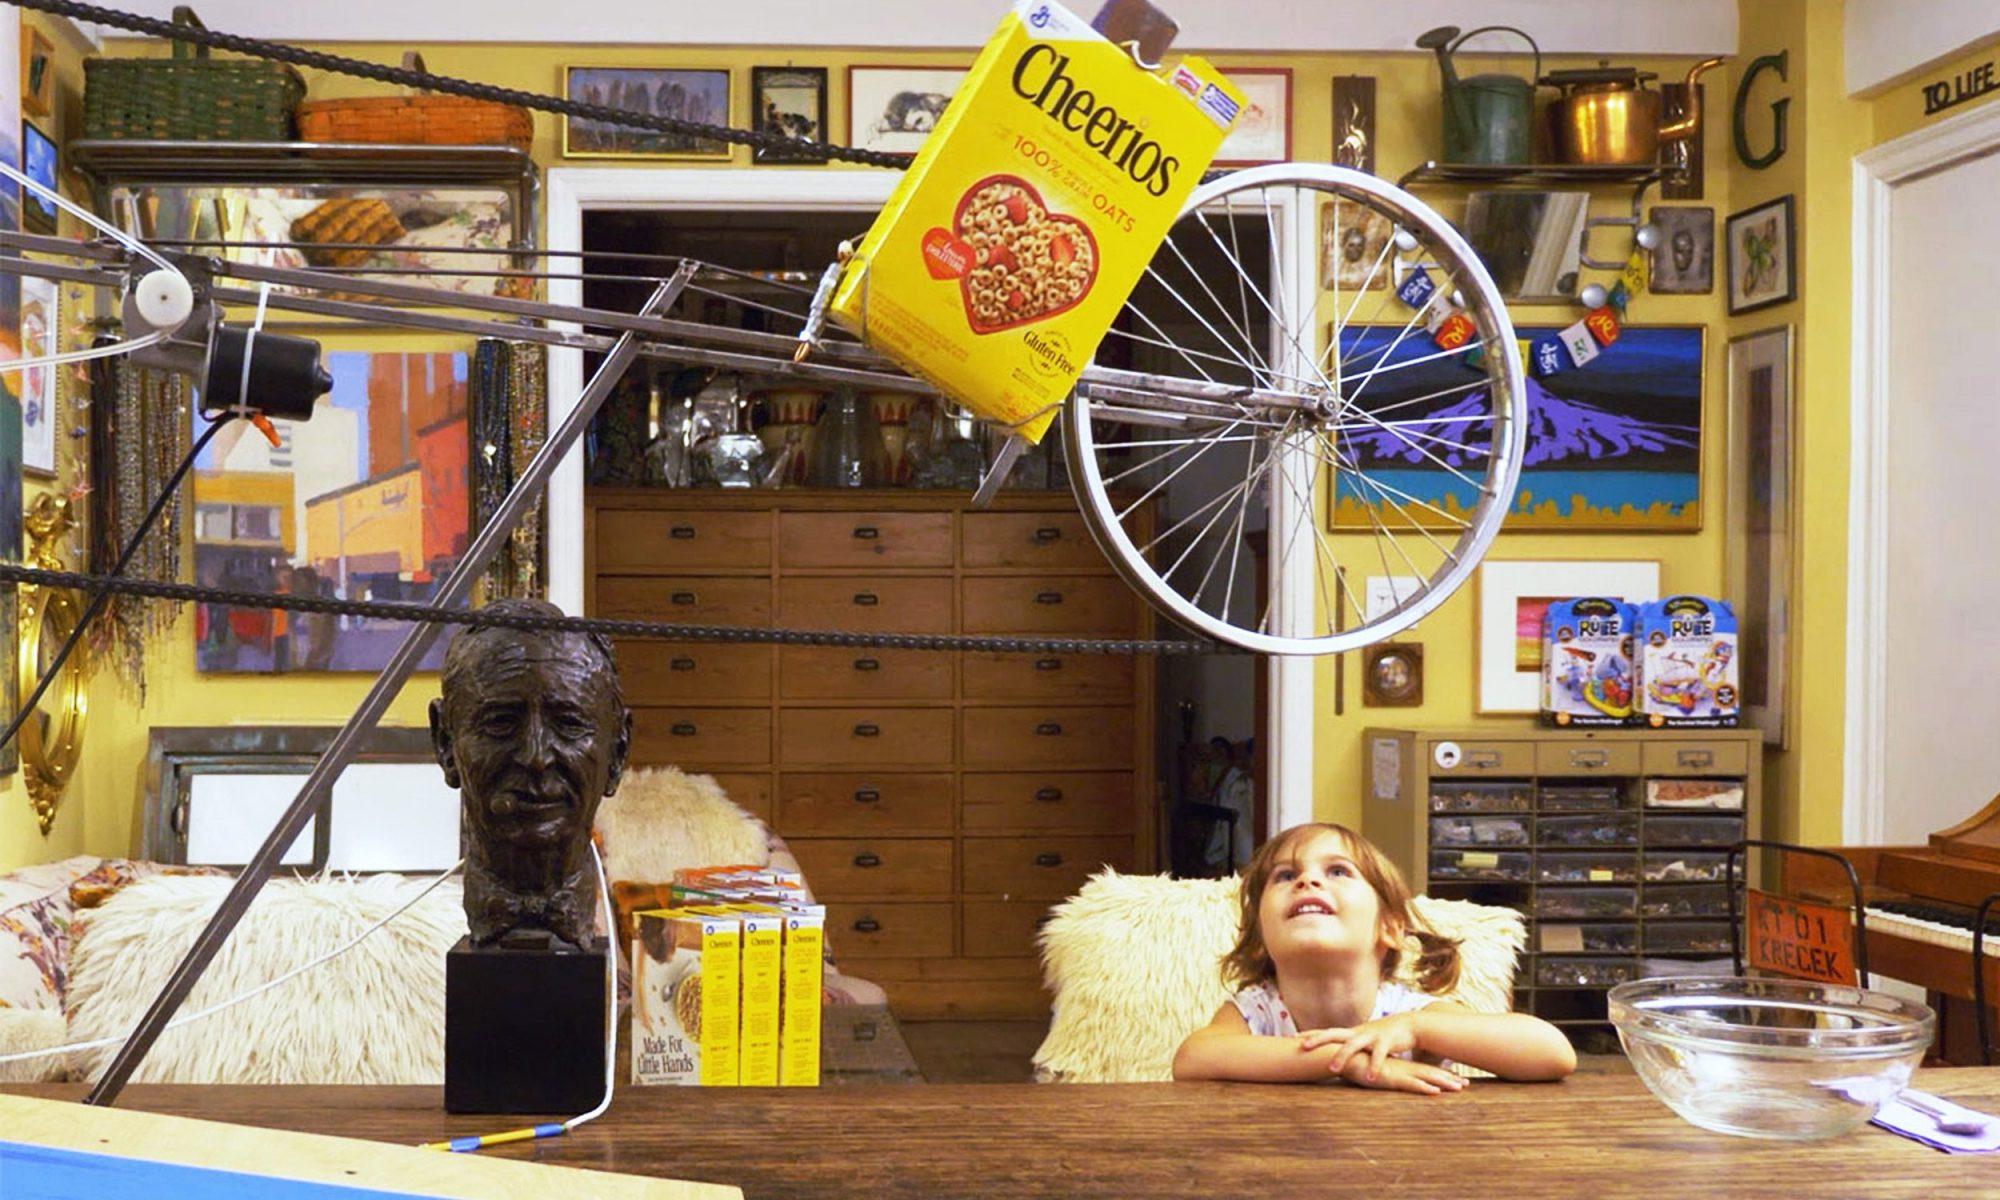 EC: 2018 Rube Goldberg Machine Contest Asks Participants to 'Pour a Bowl of Cereal'